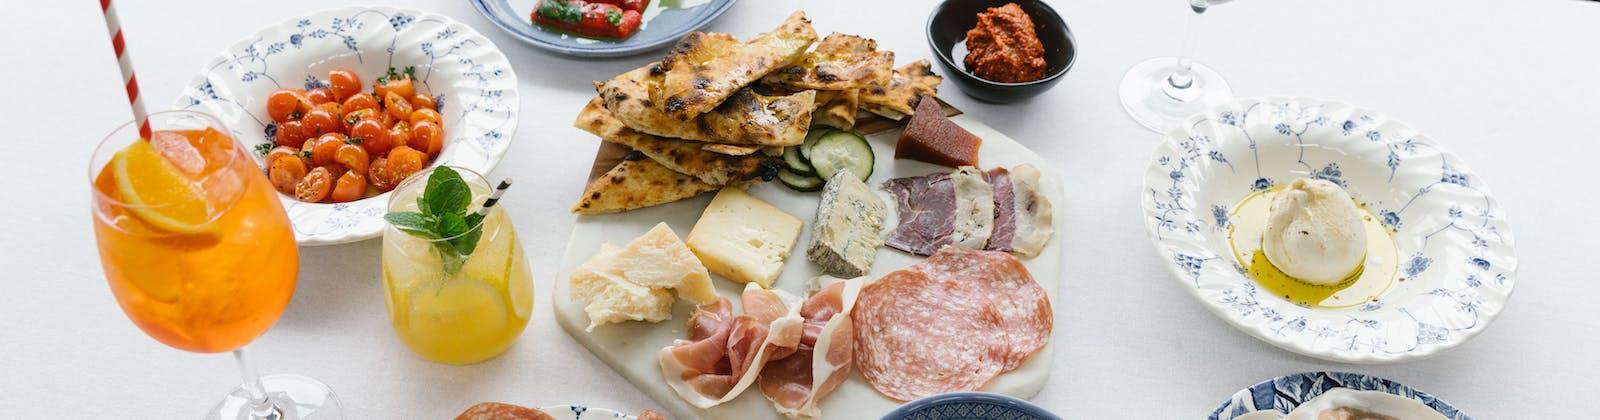 elmos bottomless italian brunch